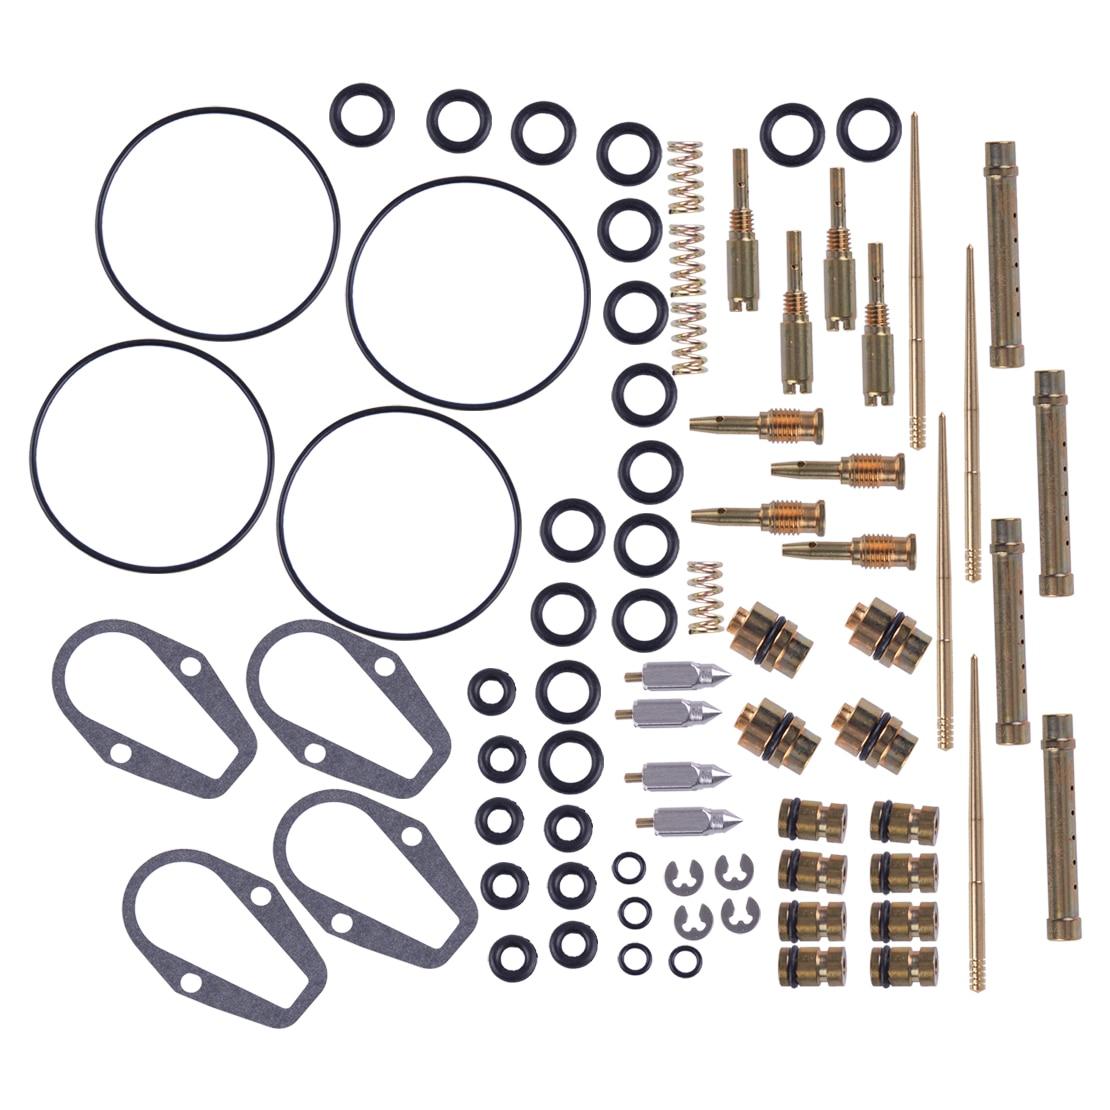 LETAOSK 4 Set Carburetor Rebuild Carb Repair Kit Jets Gasket Fit For Honda CB500K CB500 Four CB 500 R92